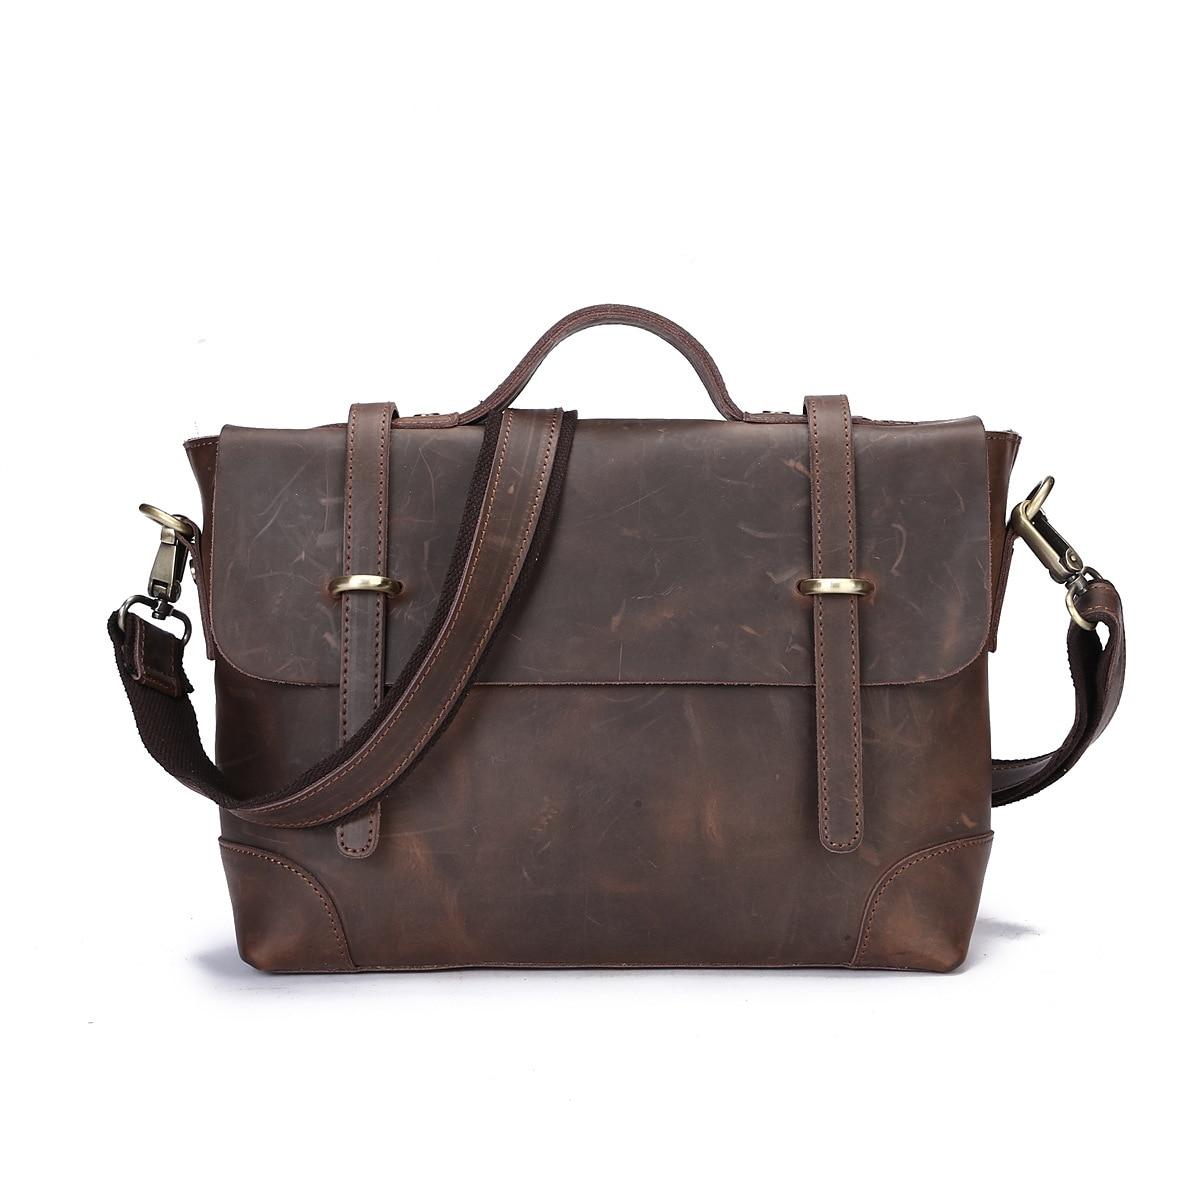 100% Genuine Leather Shoulder Bag Men Fashion Design Handbags Male Crazy Horse Leather Briefcase Business Laptop Messenger Bags